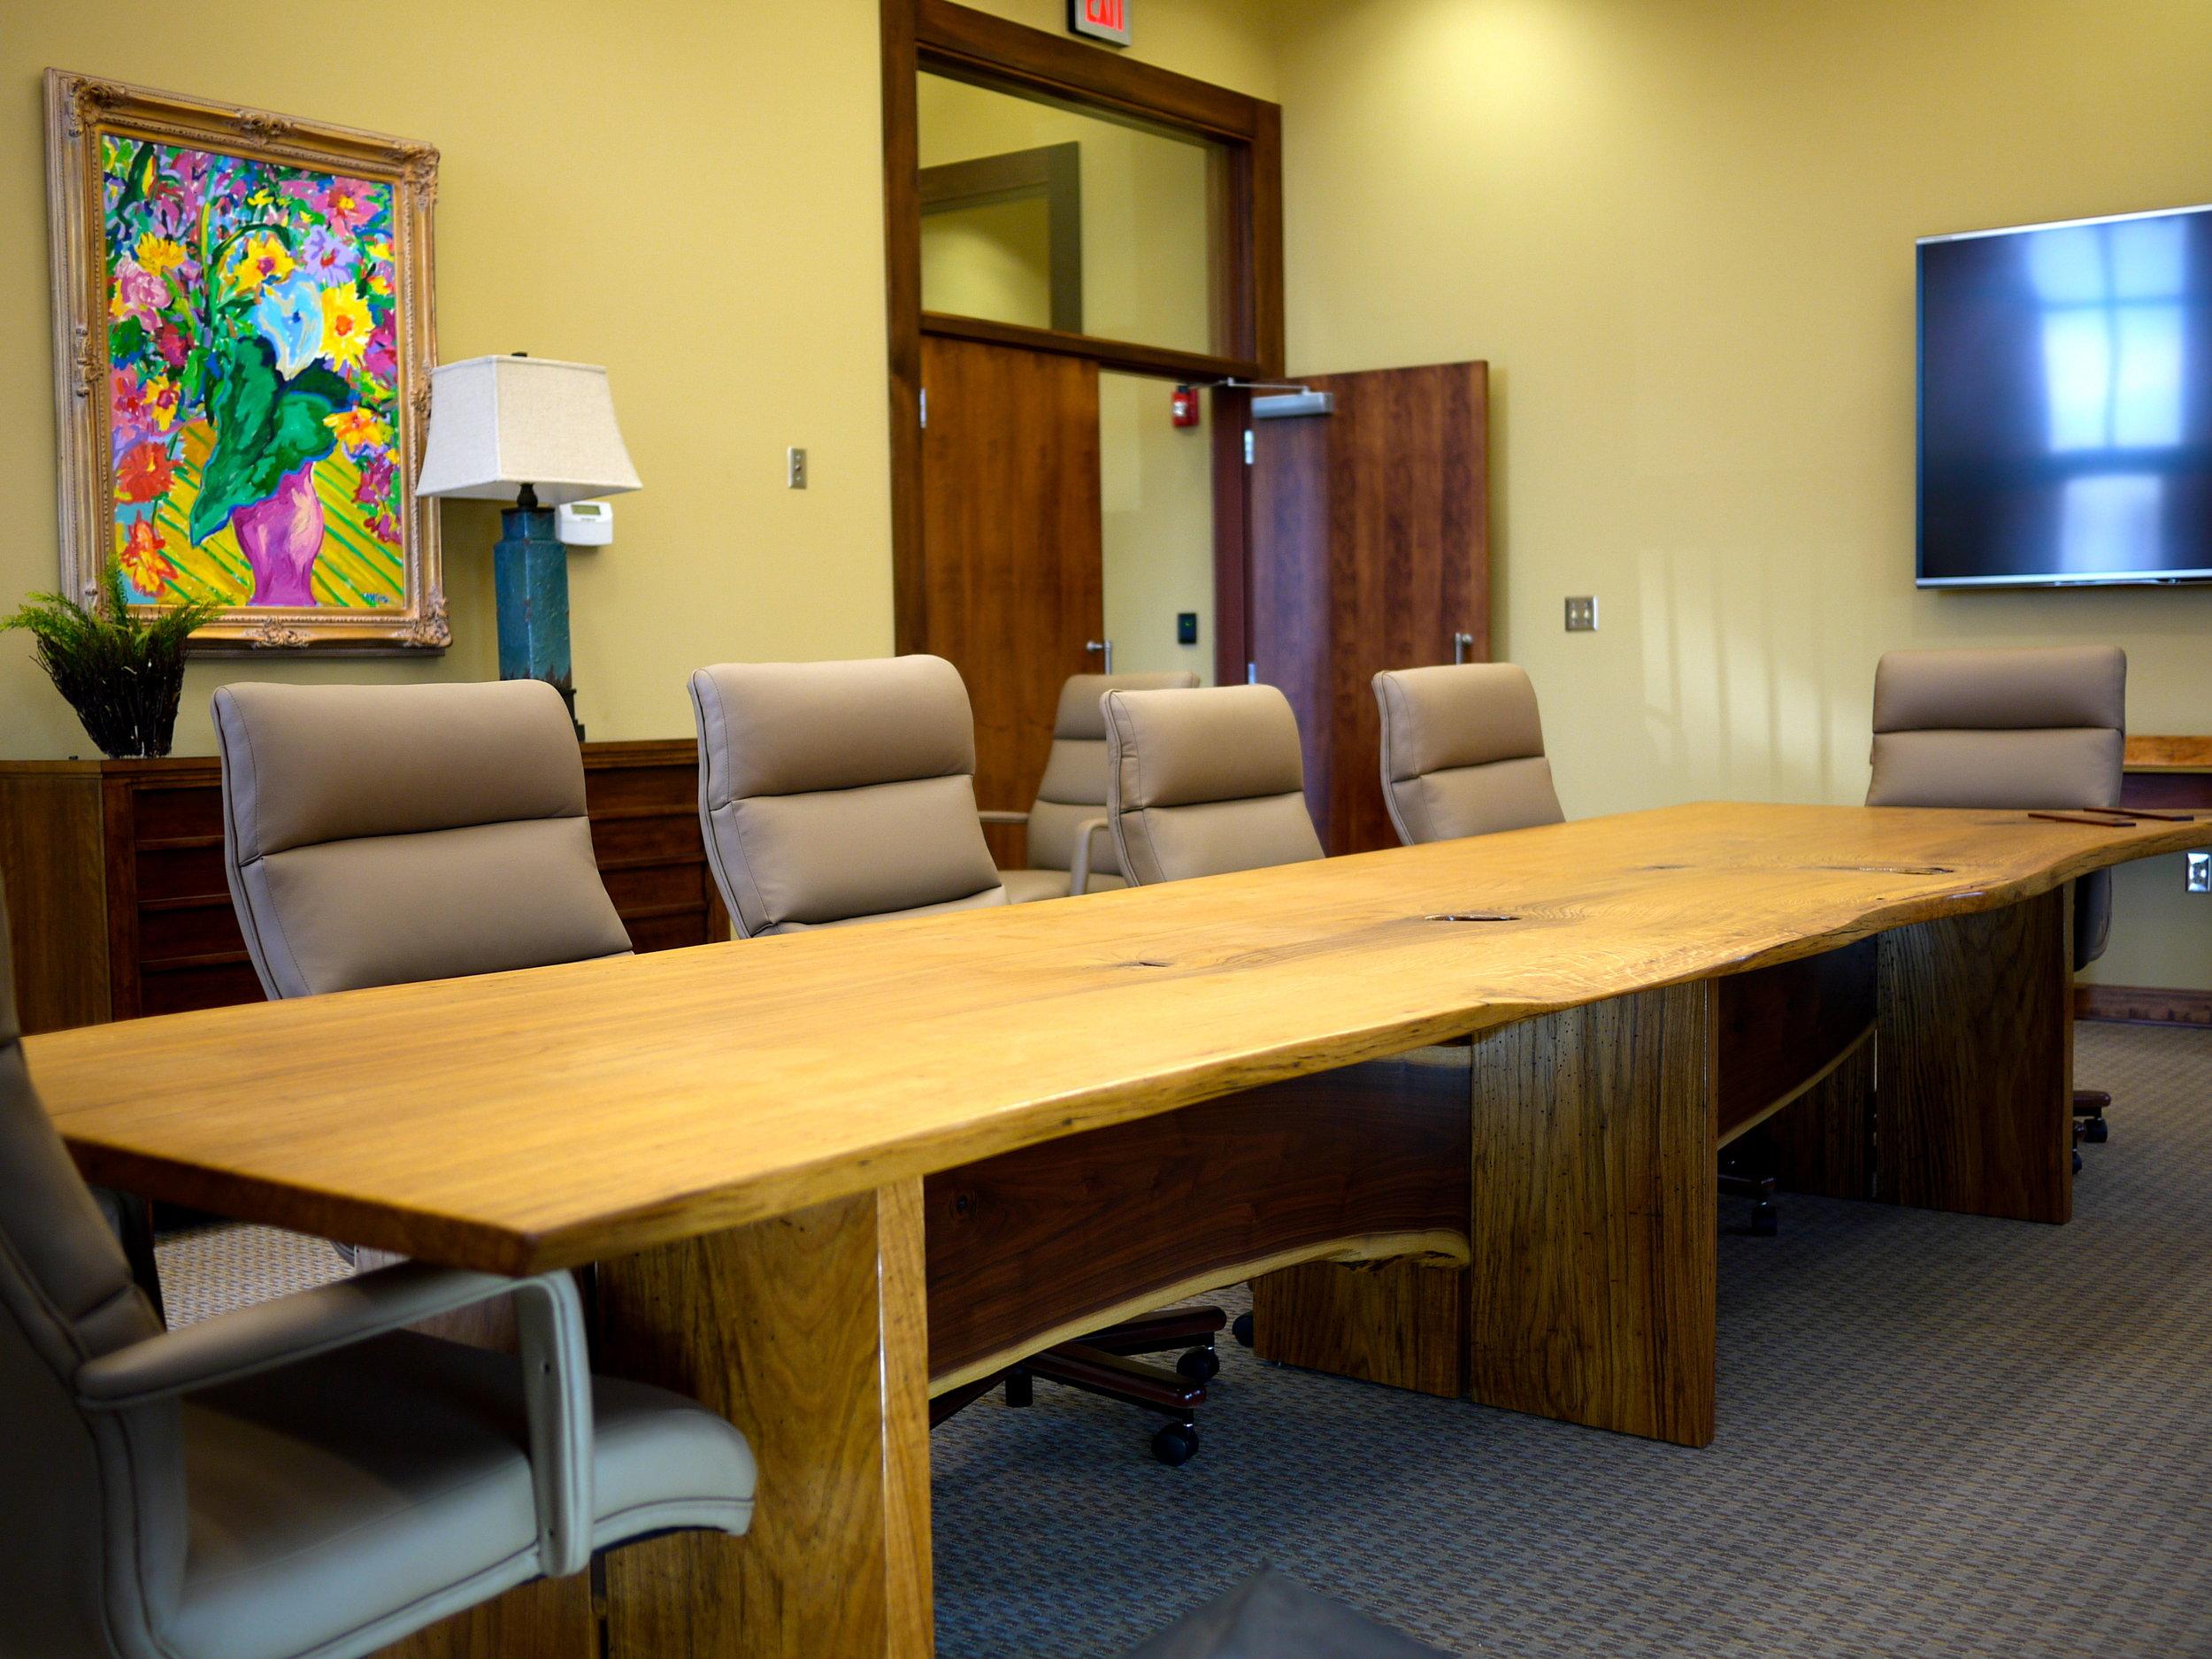 3progress conference table.jpg